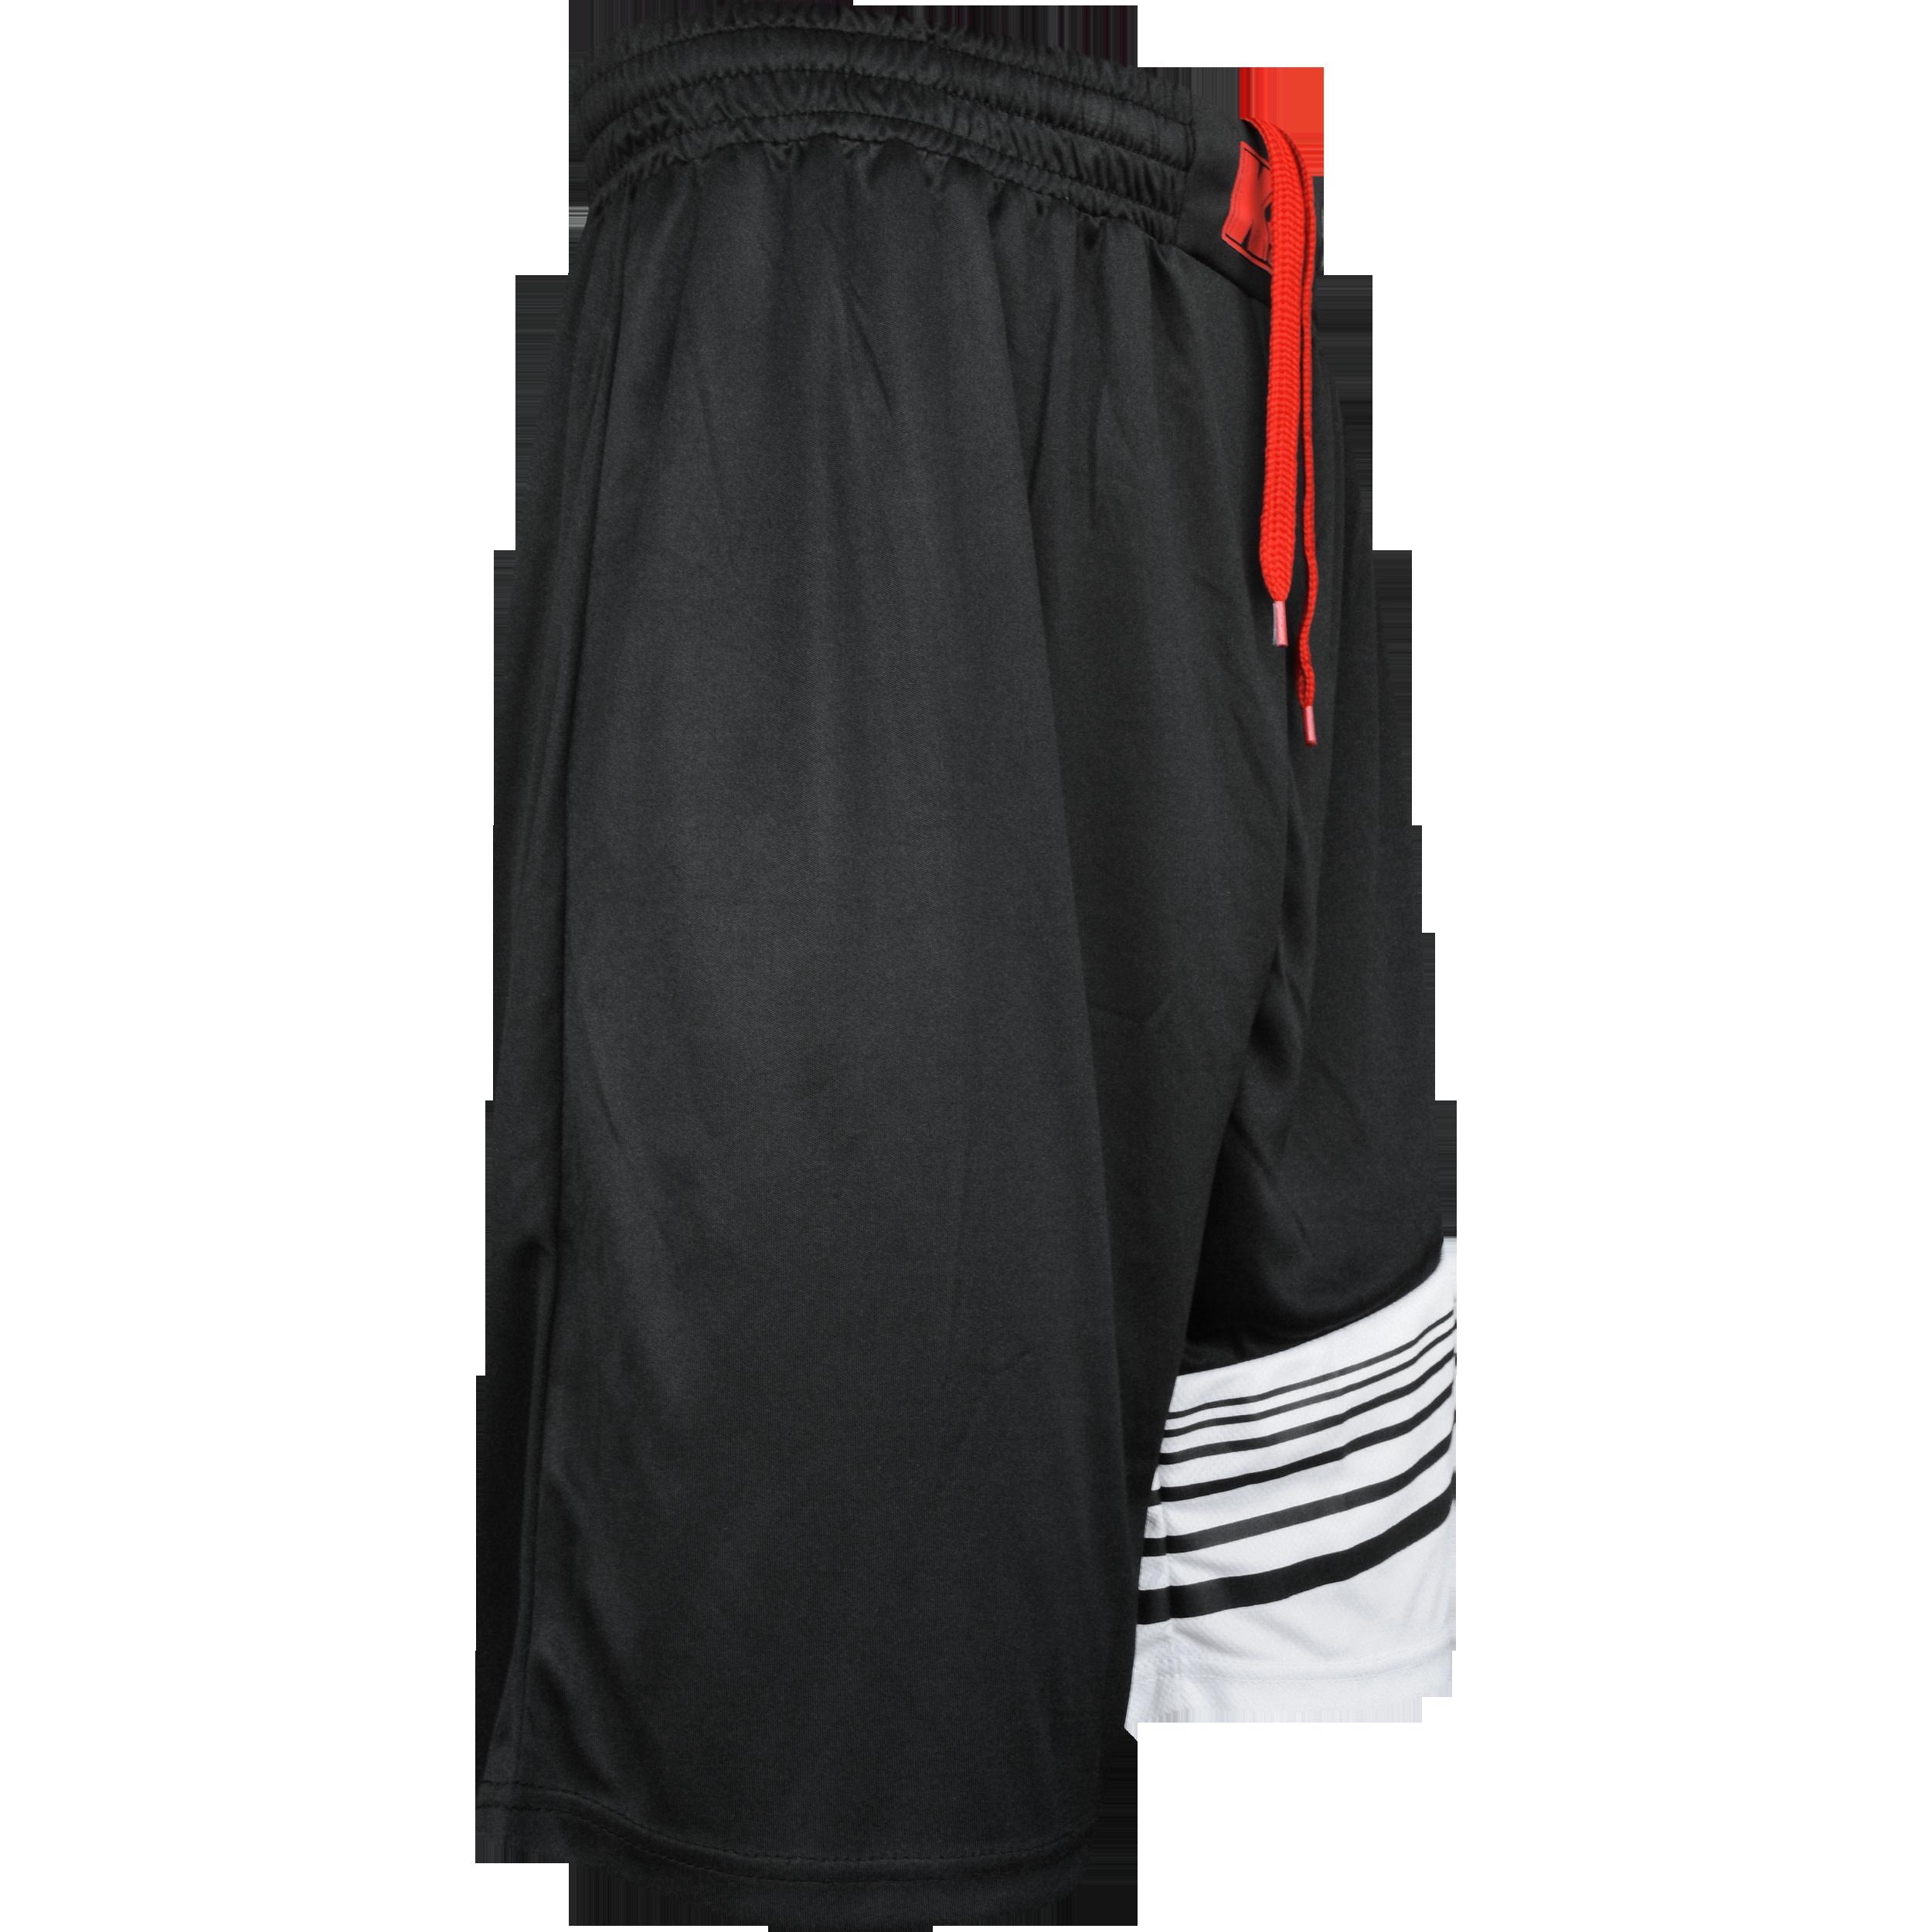 KEEPERsport GK Shorts GuKra5 (white)